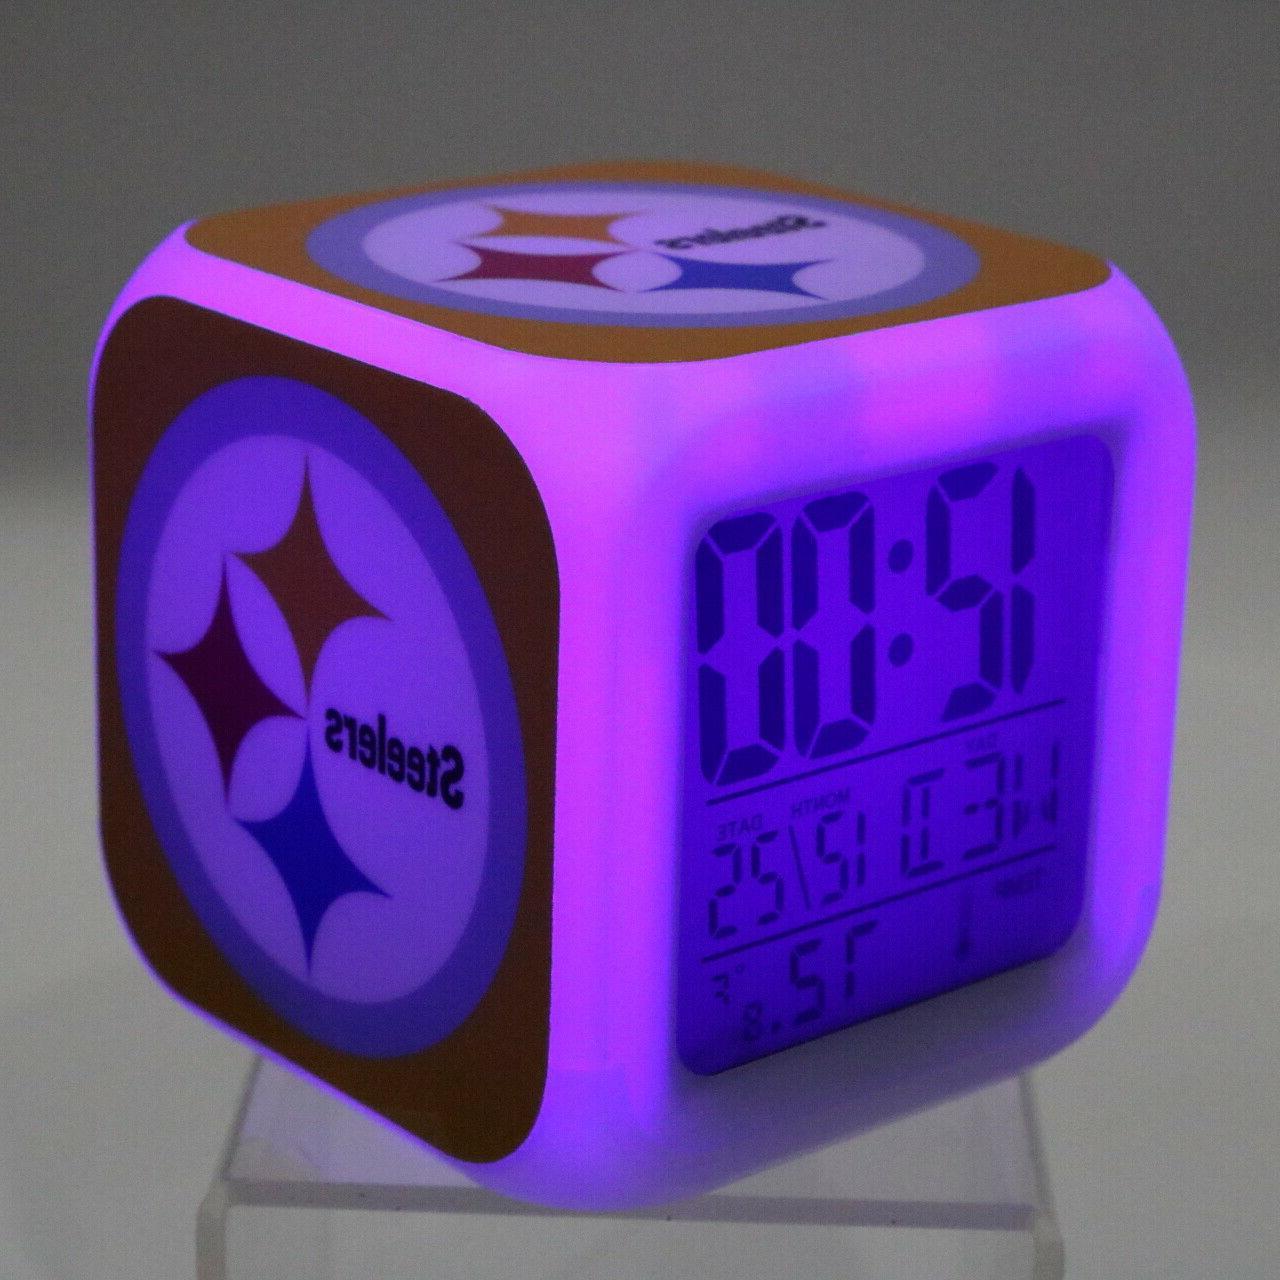 Pittsburgh Steelers Alarm Decor Gift